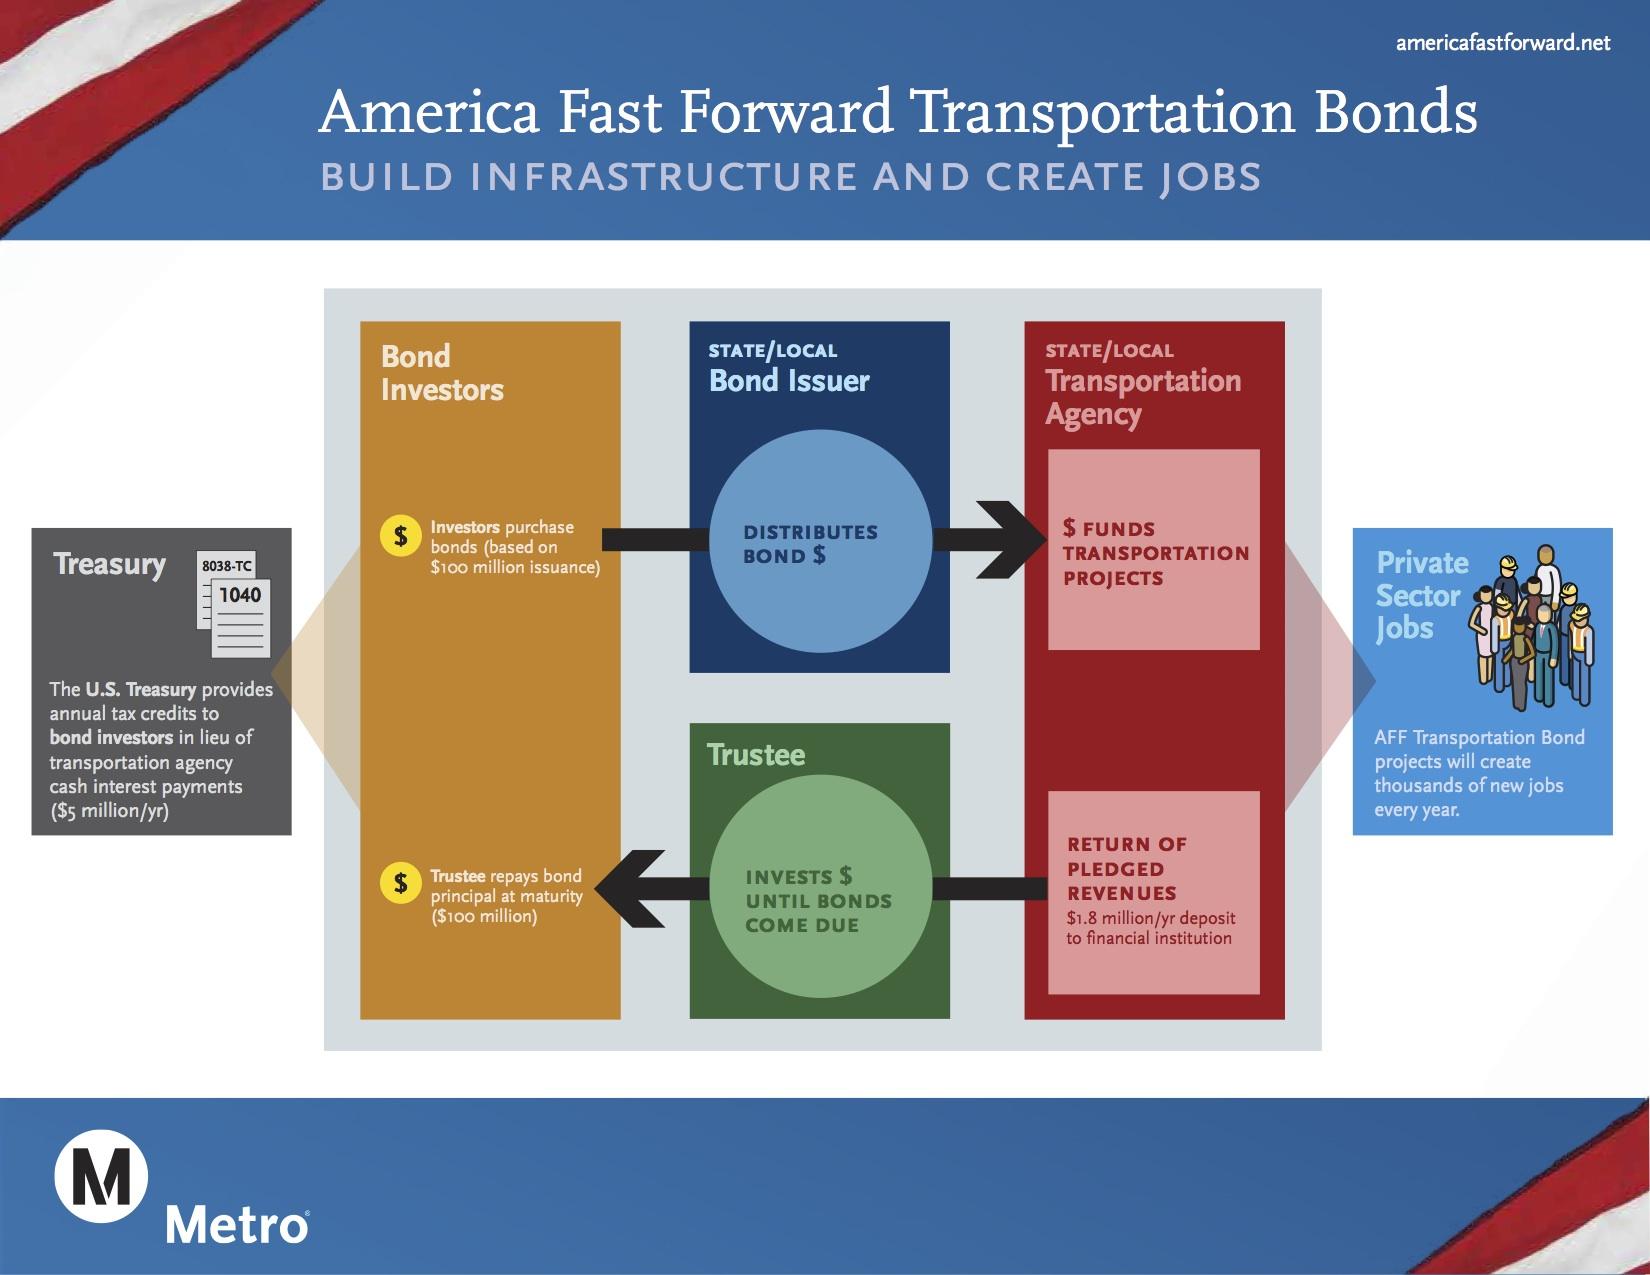 America Fast Forward Bonds